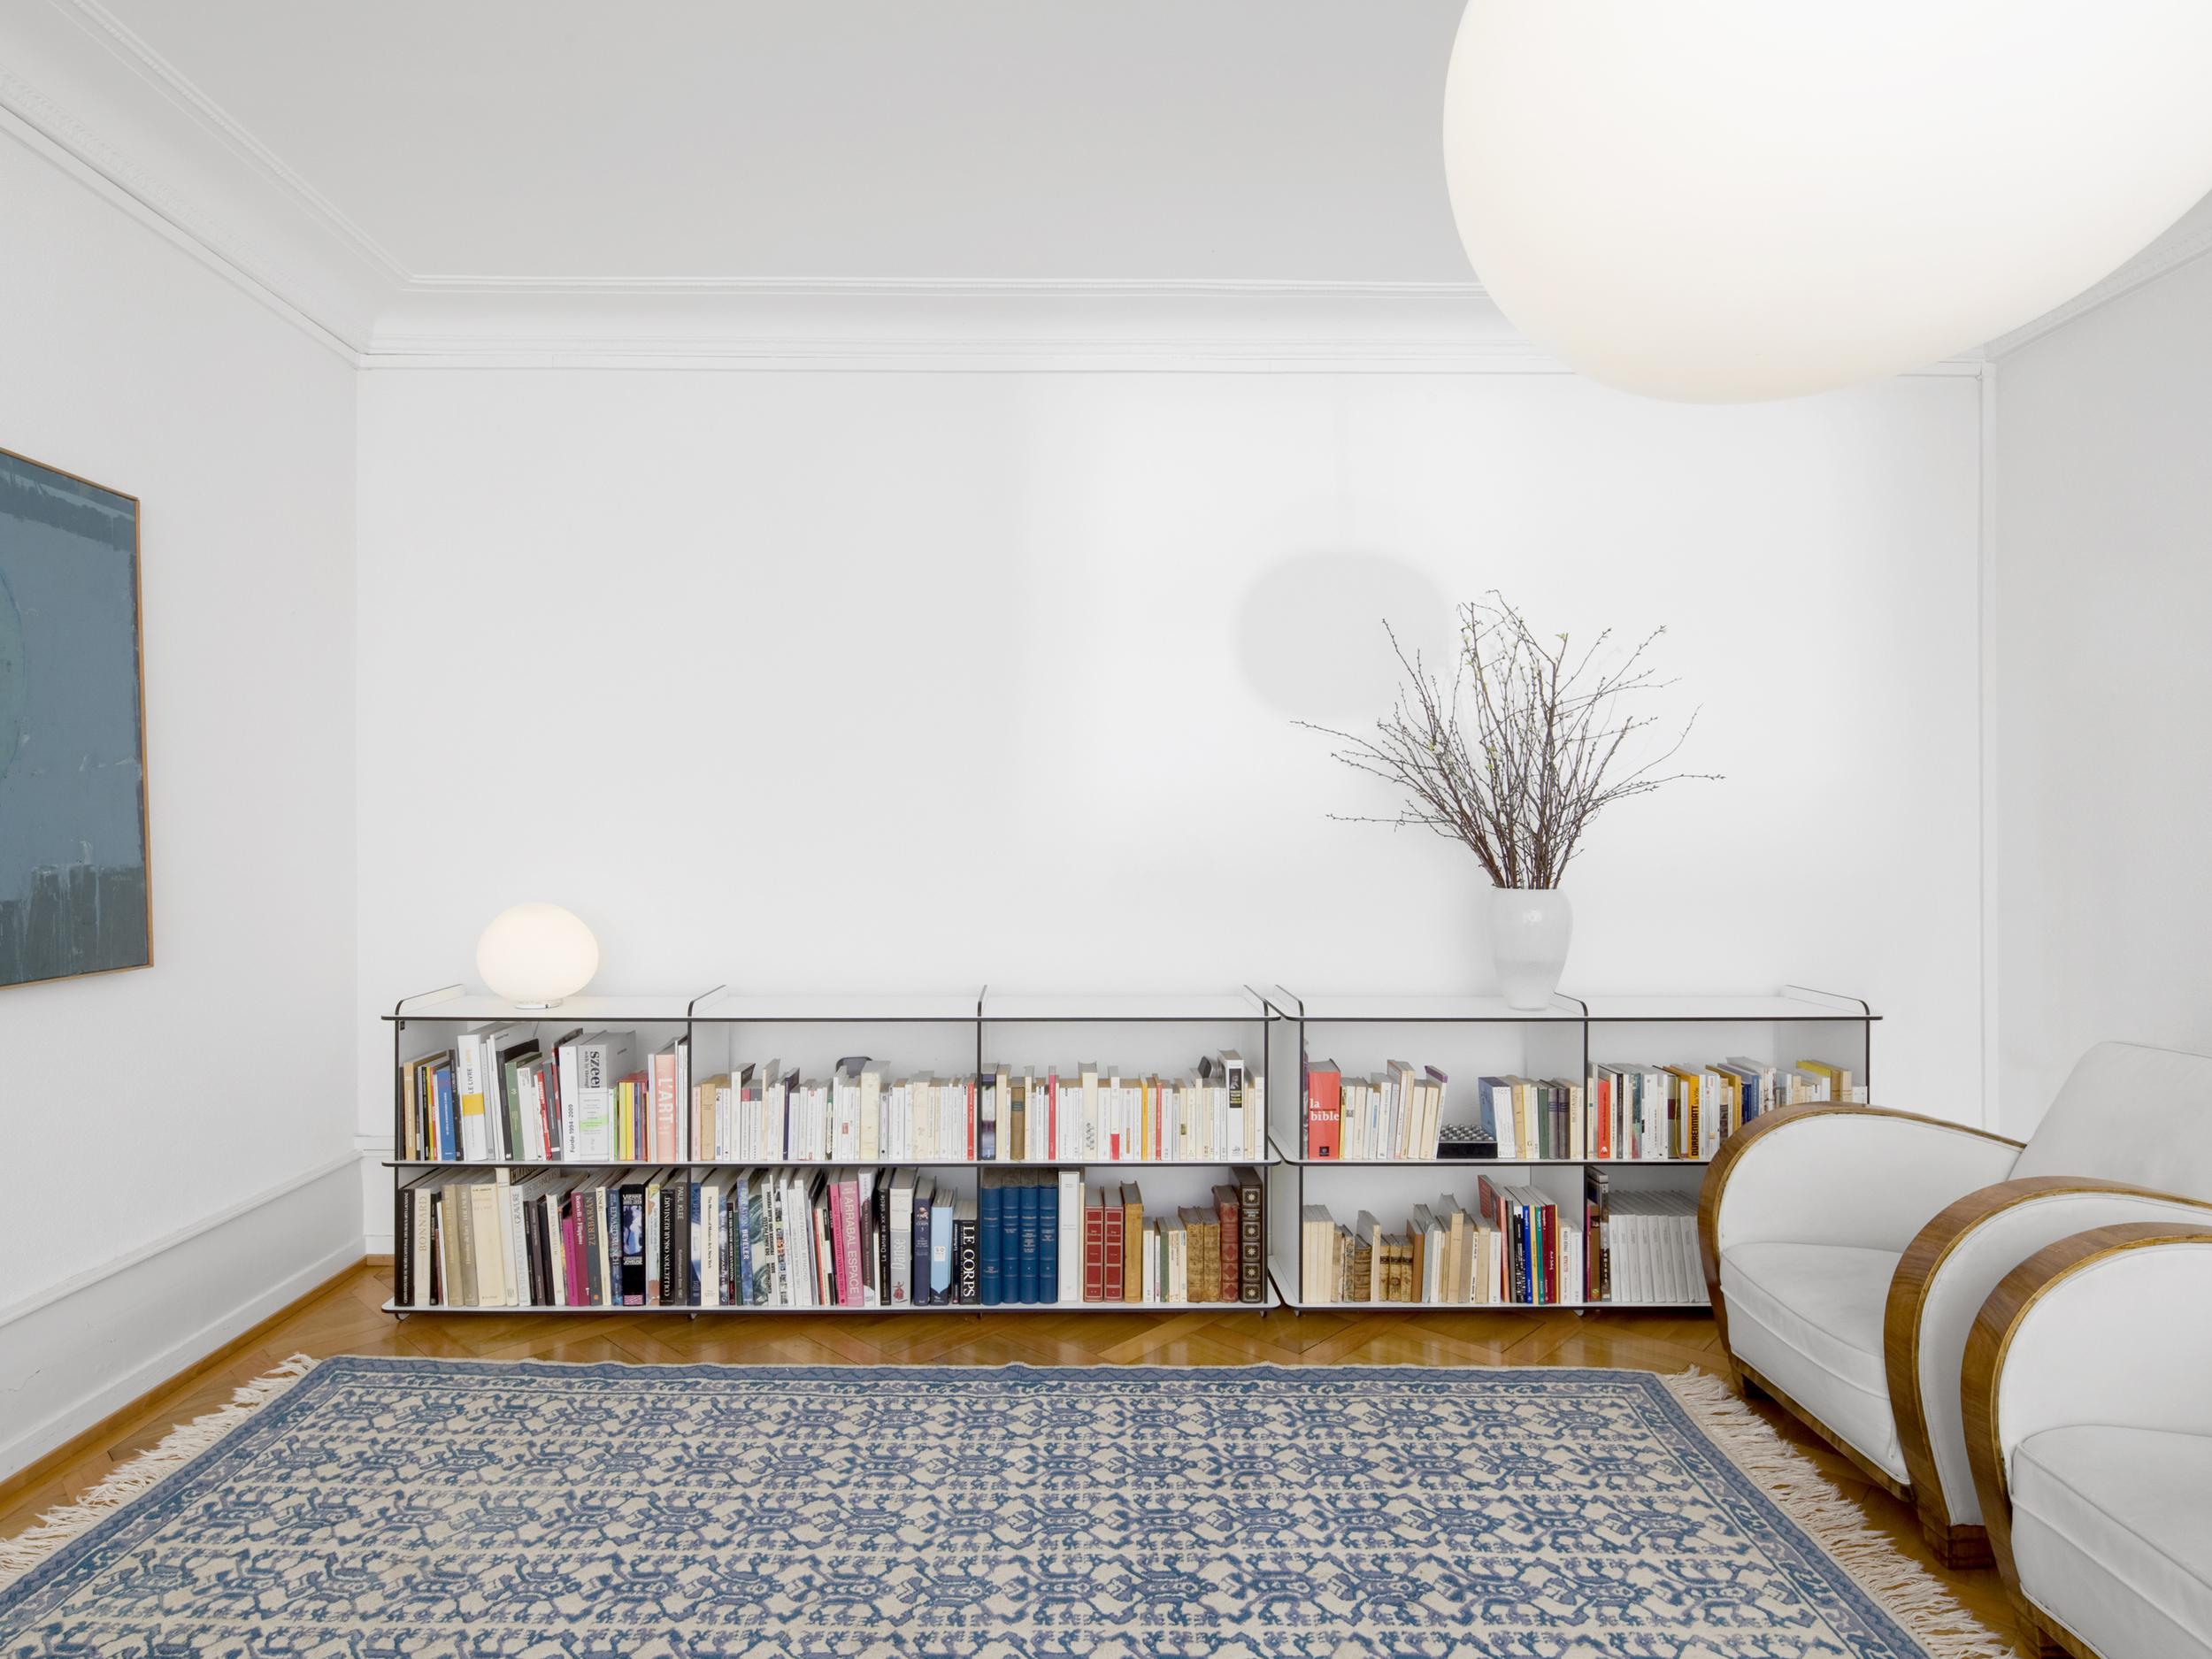 36 Furniture System - Christian Dupraz - 2014